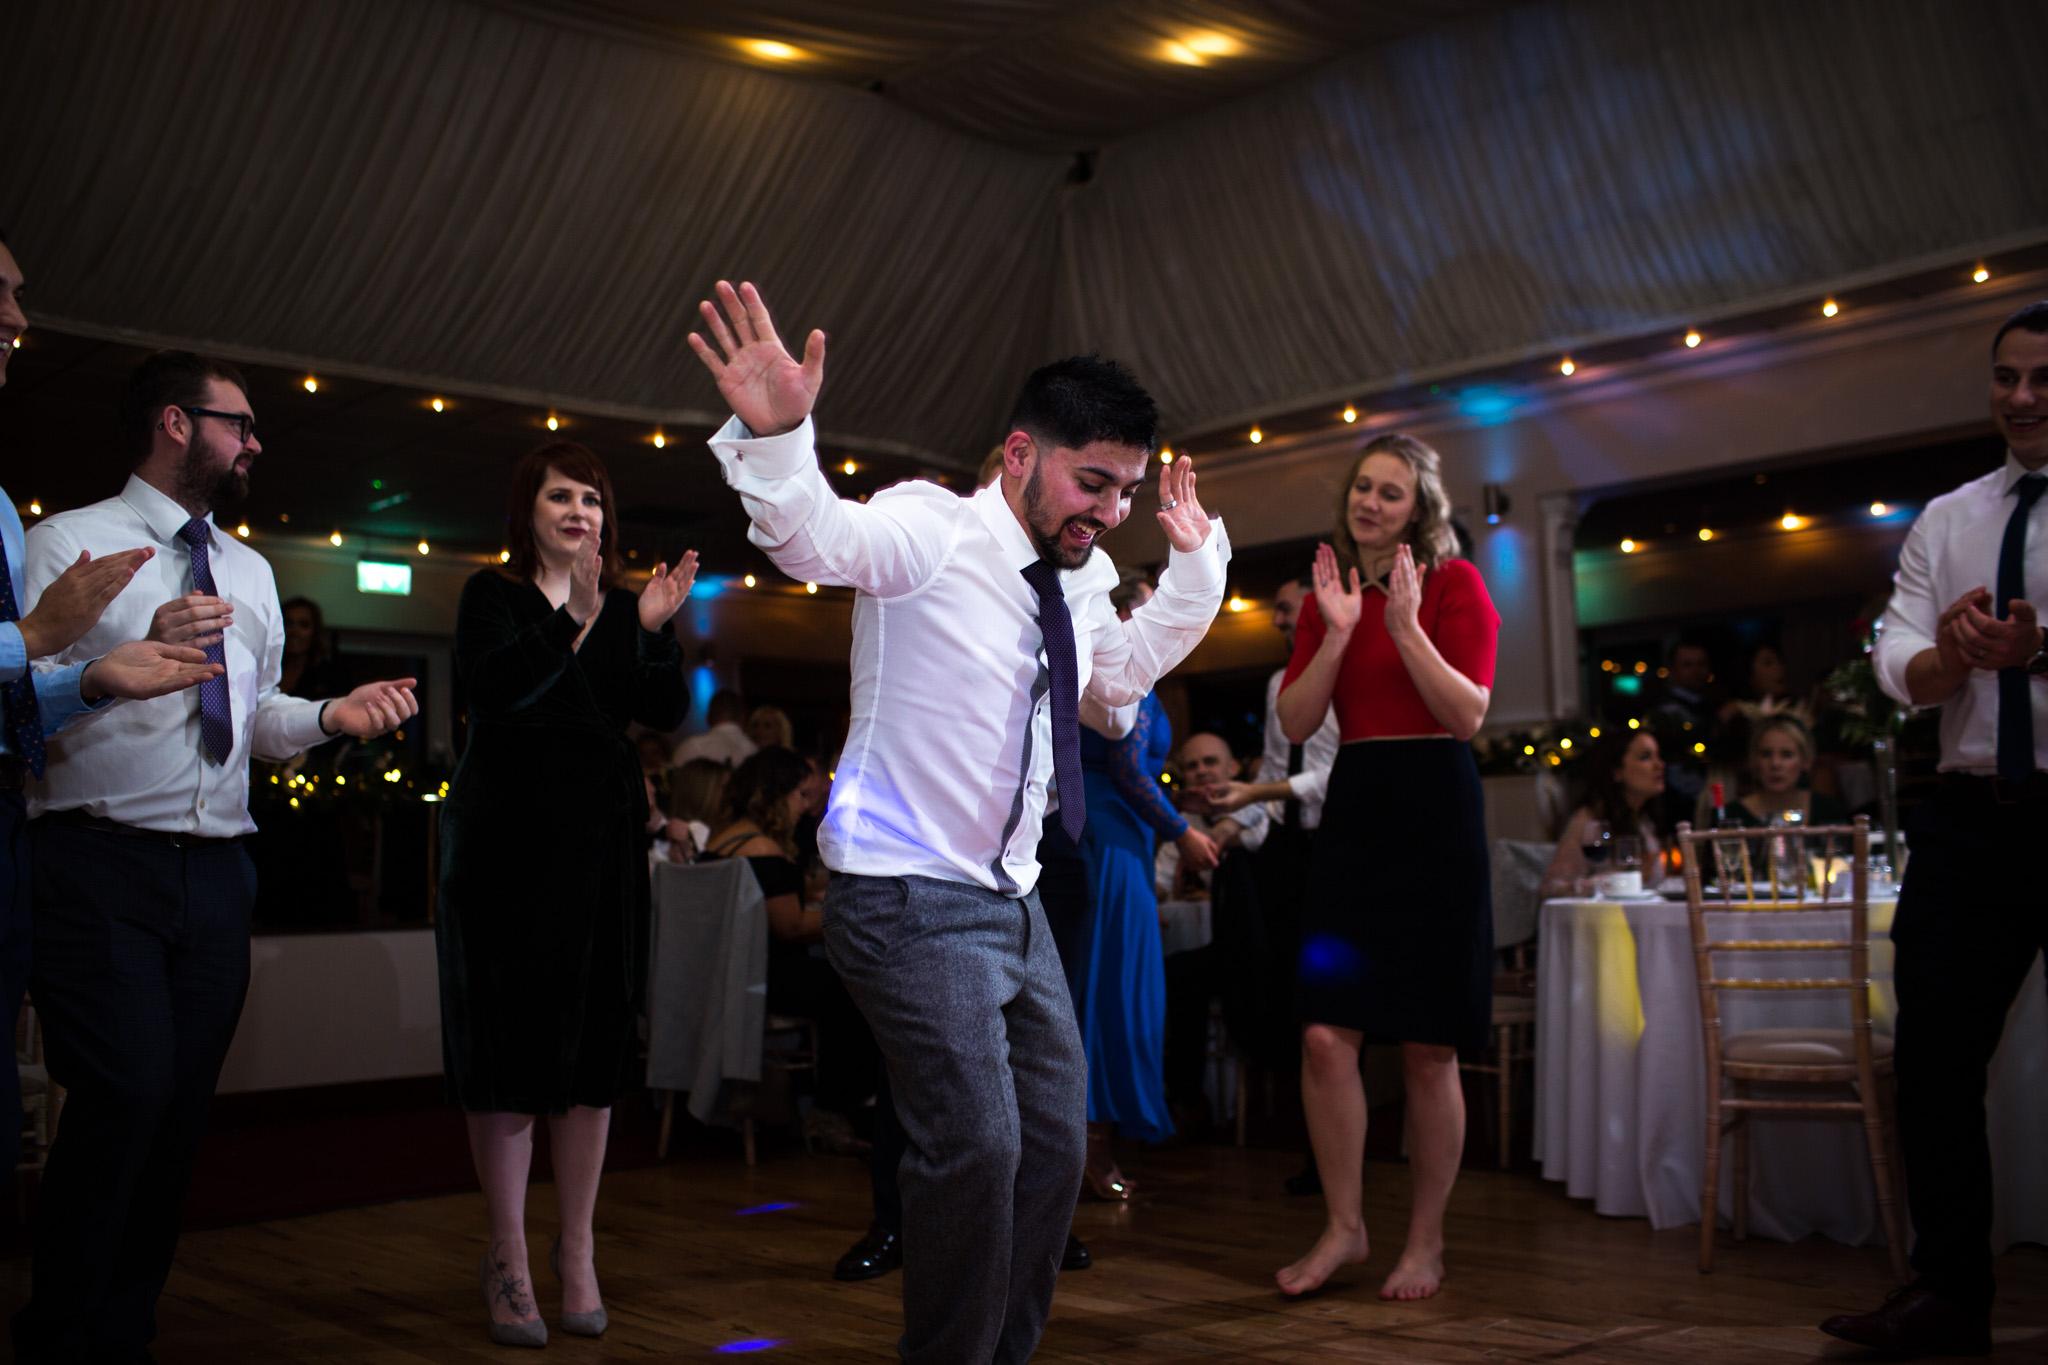 Mark_Barnes_Northern_Ireland_wedding_photographer_Harveys_Point_Donegall_Wedding_photography-Adam&Gemma-66.jpg